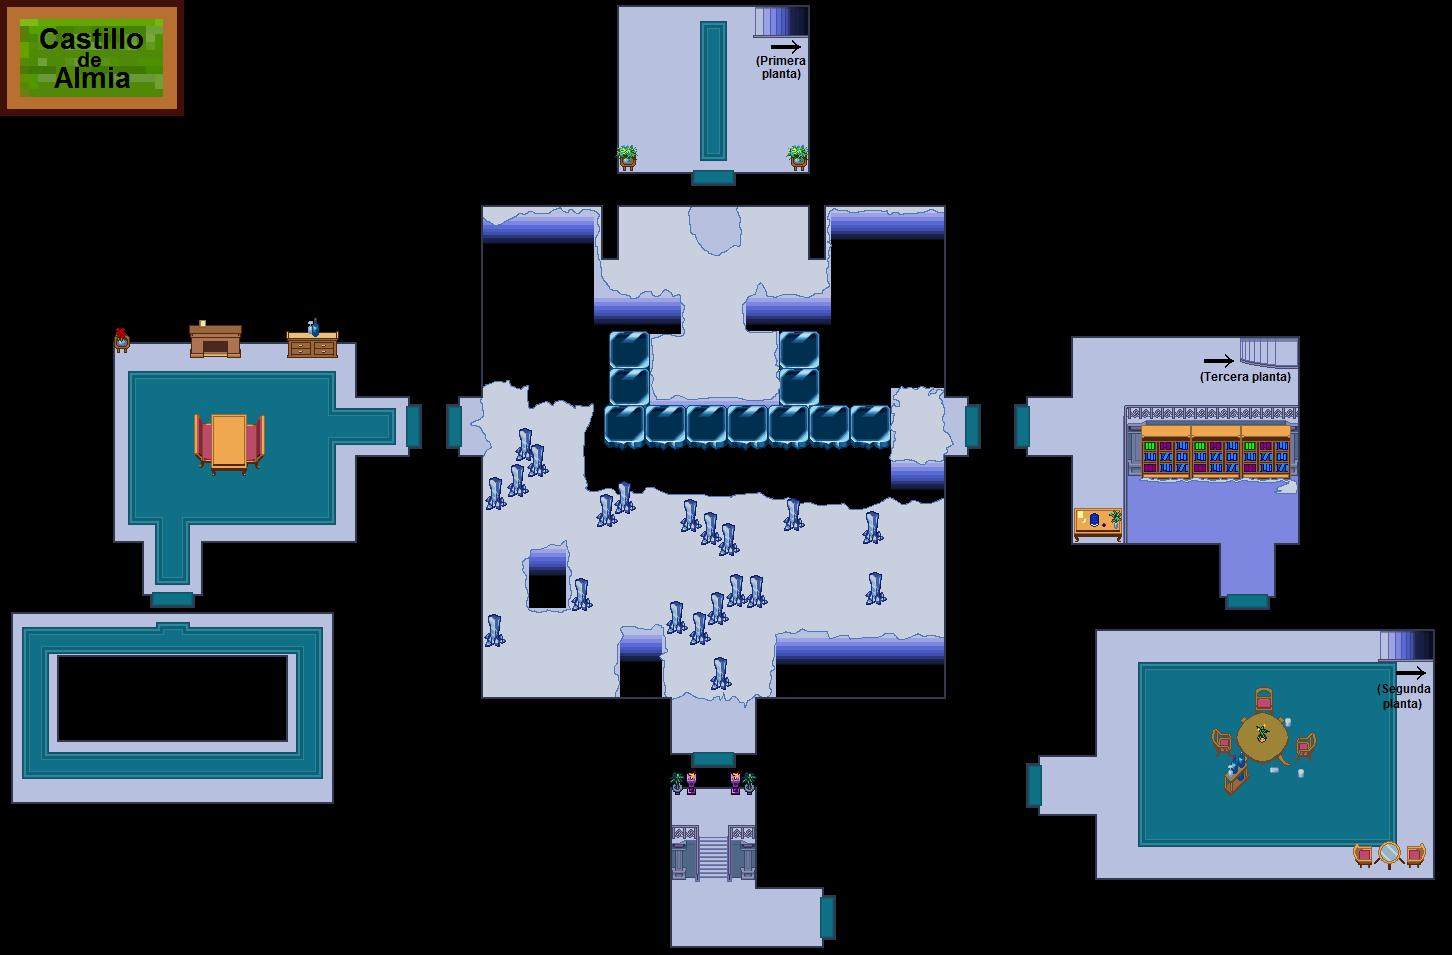 Plano de Castillo de Almia (segunda planta)